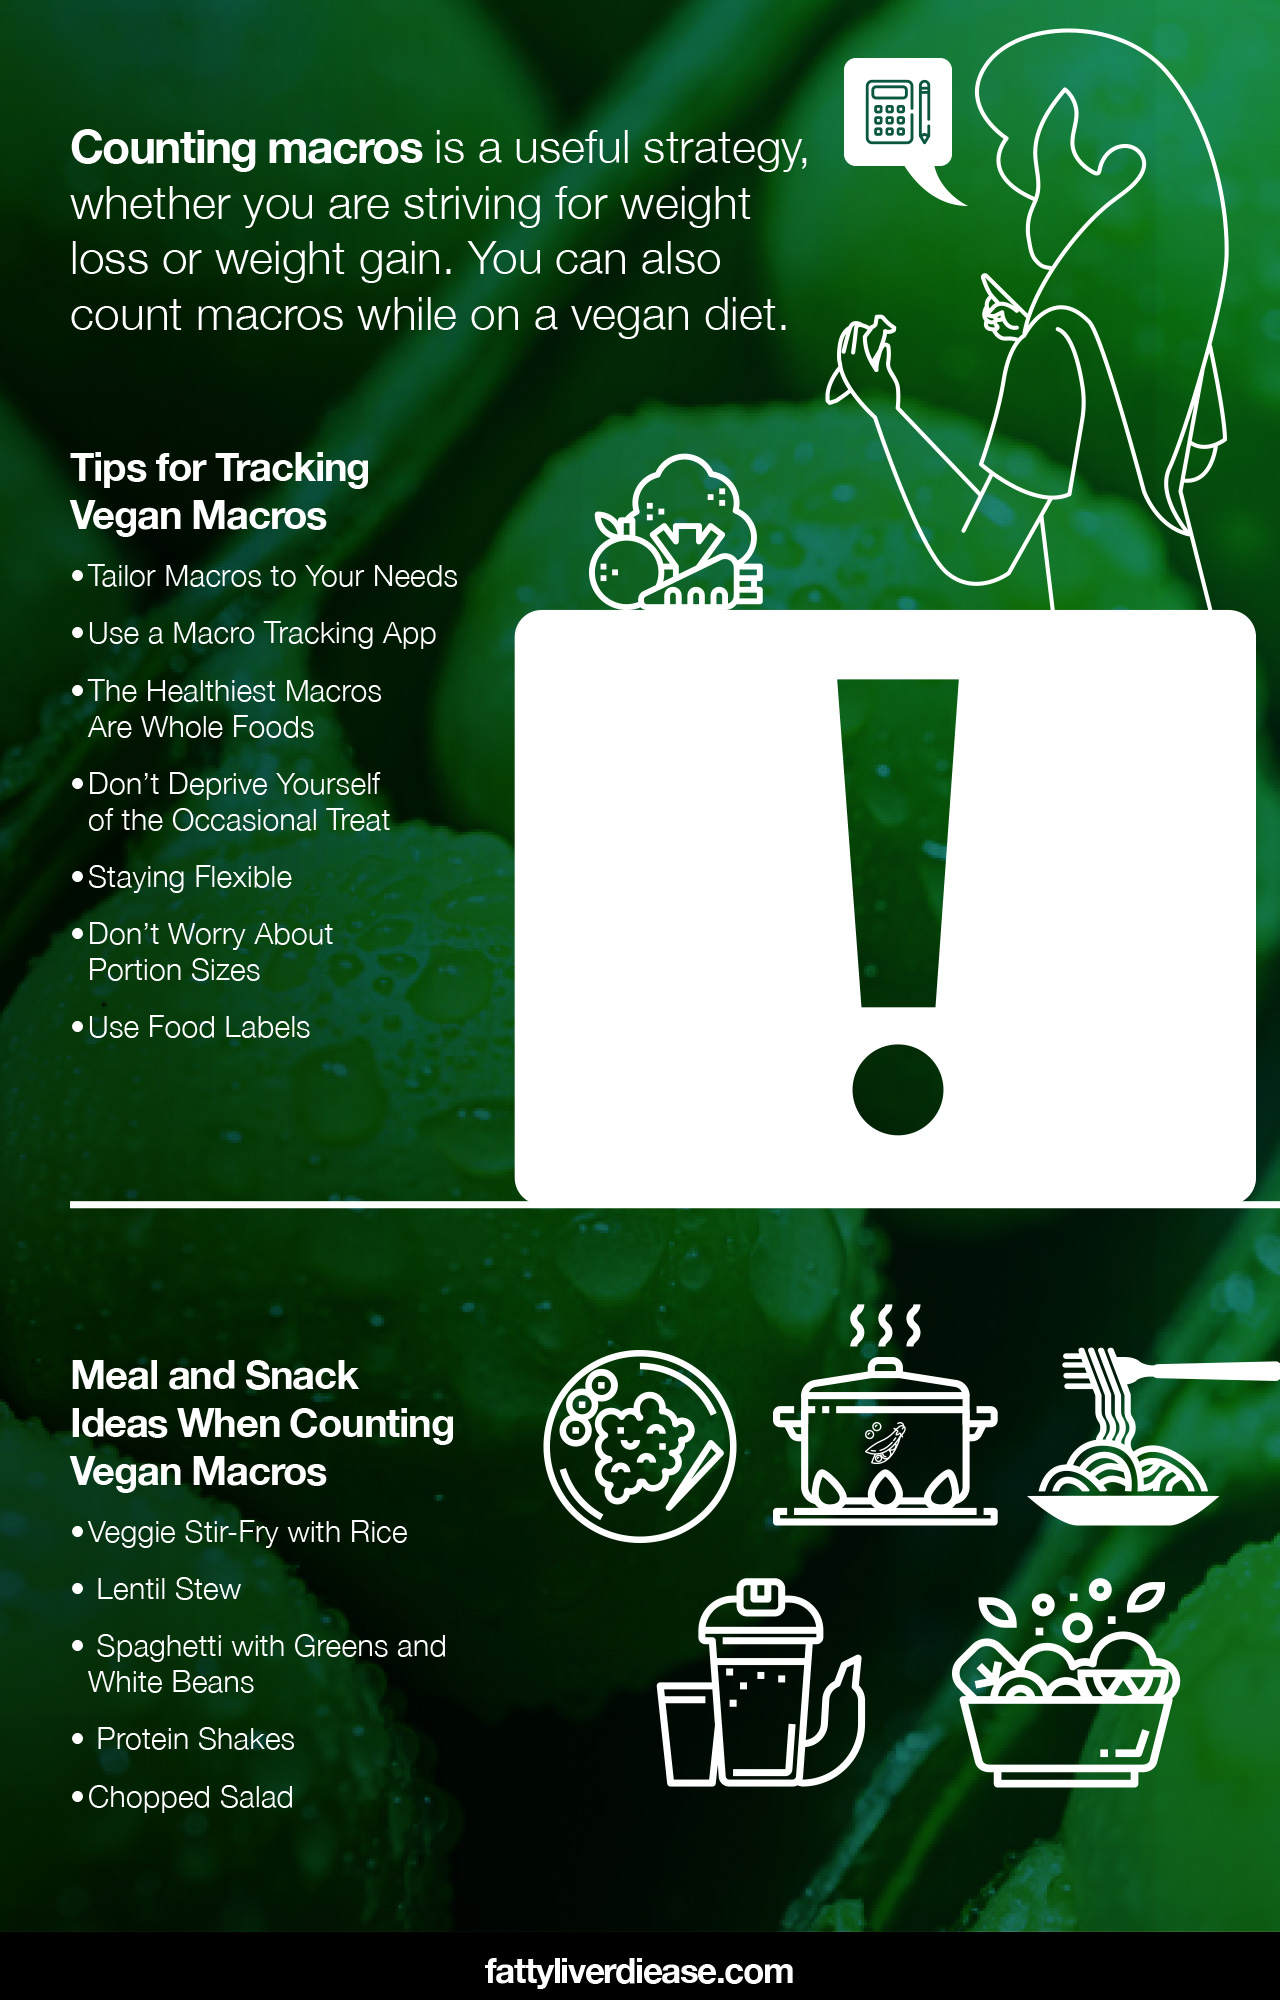 Tips for Tracking Vegan Macros